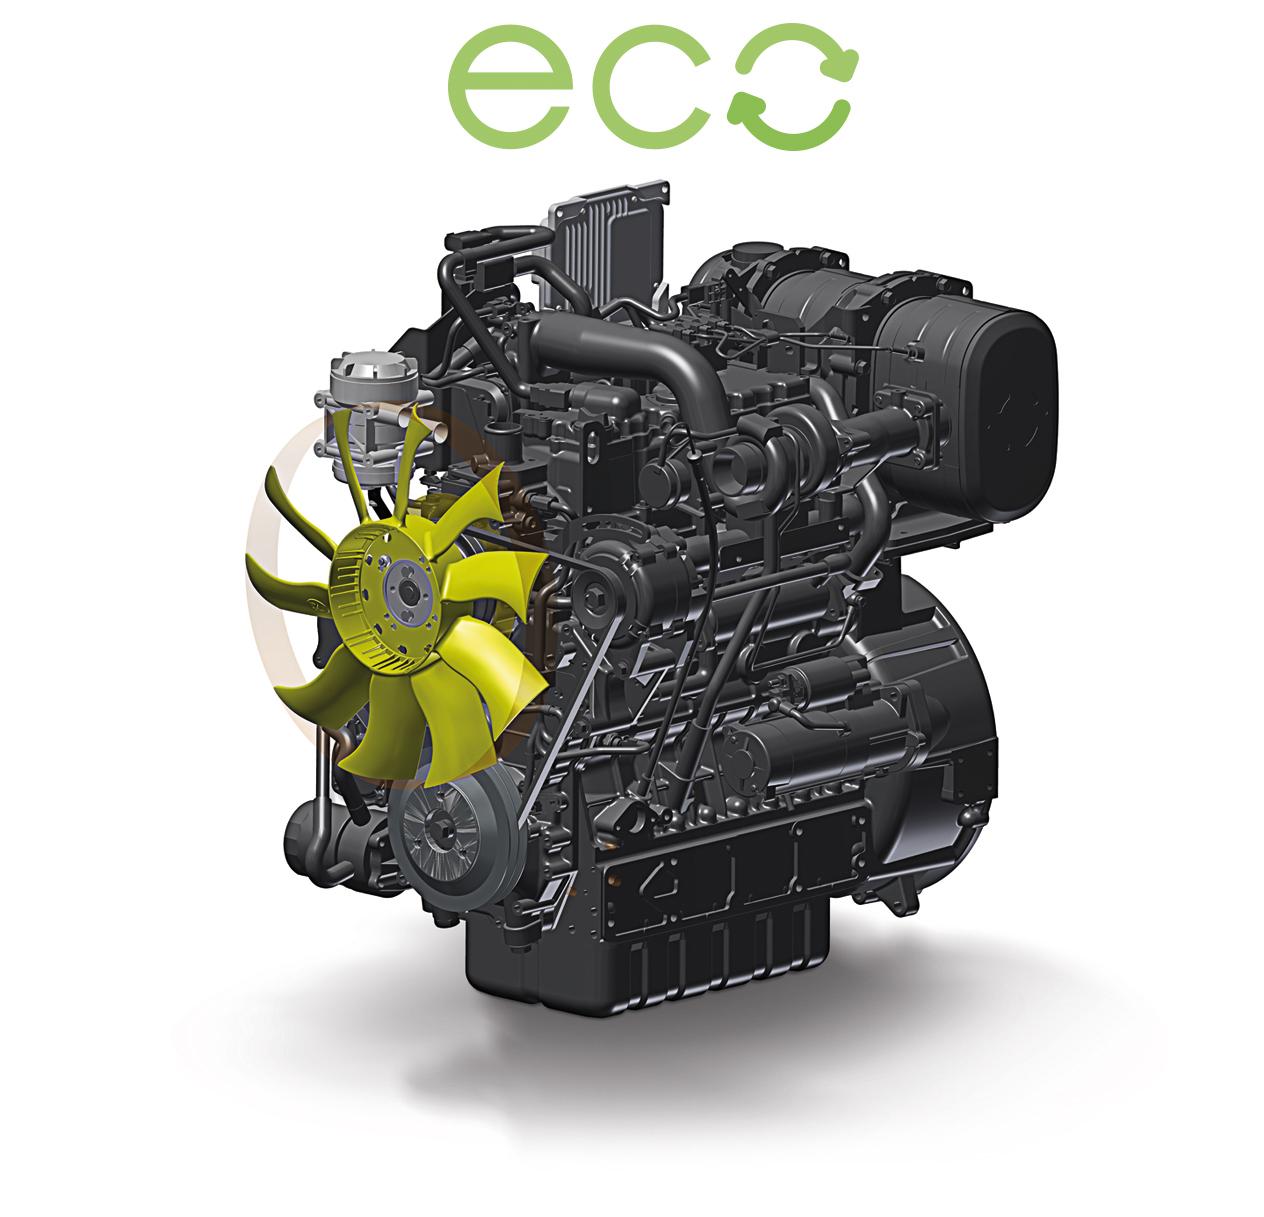 motor-eco-bcs-ferrari-pasquali